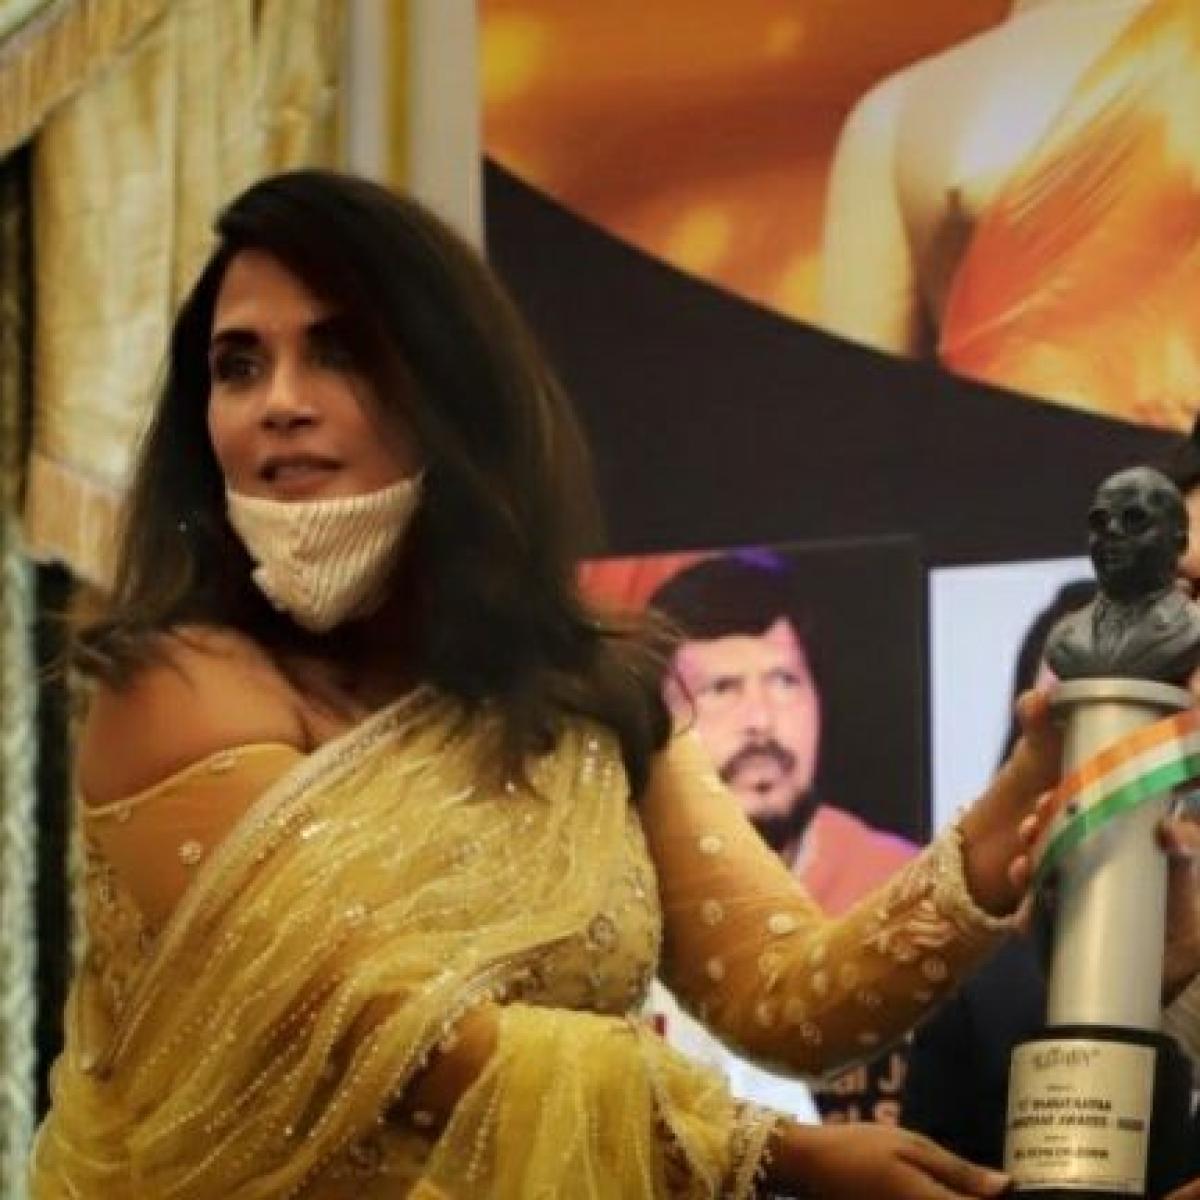 'Woke up late to the greatness of Babasaheb': Richa Chadha receives Bharat Ratna Dr Ambedkar Award